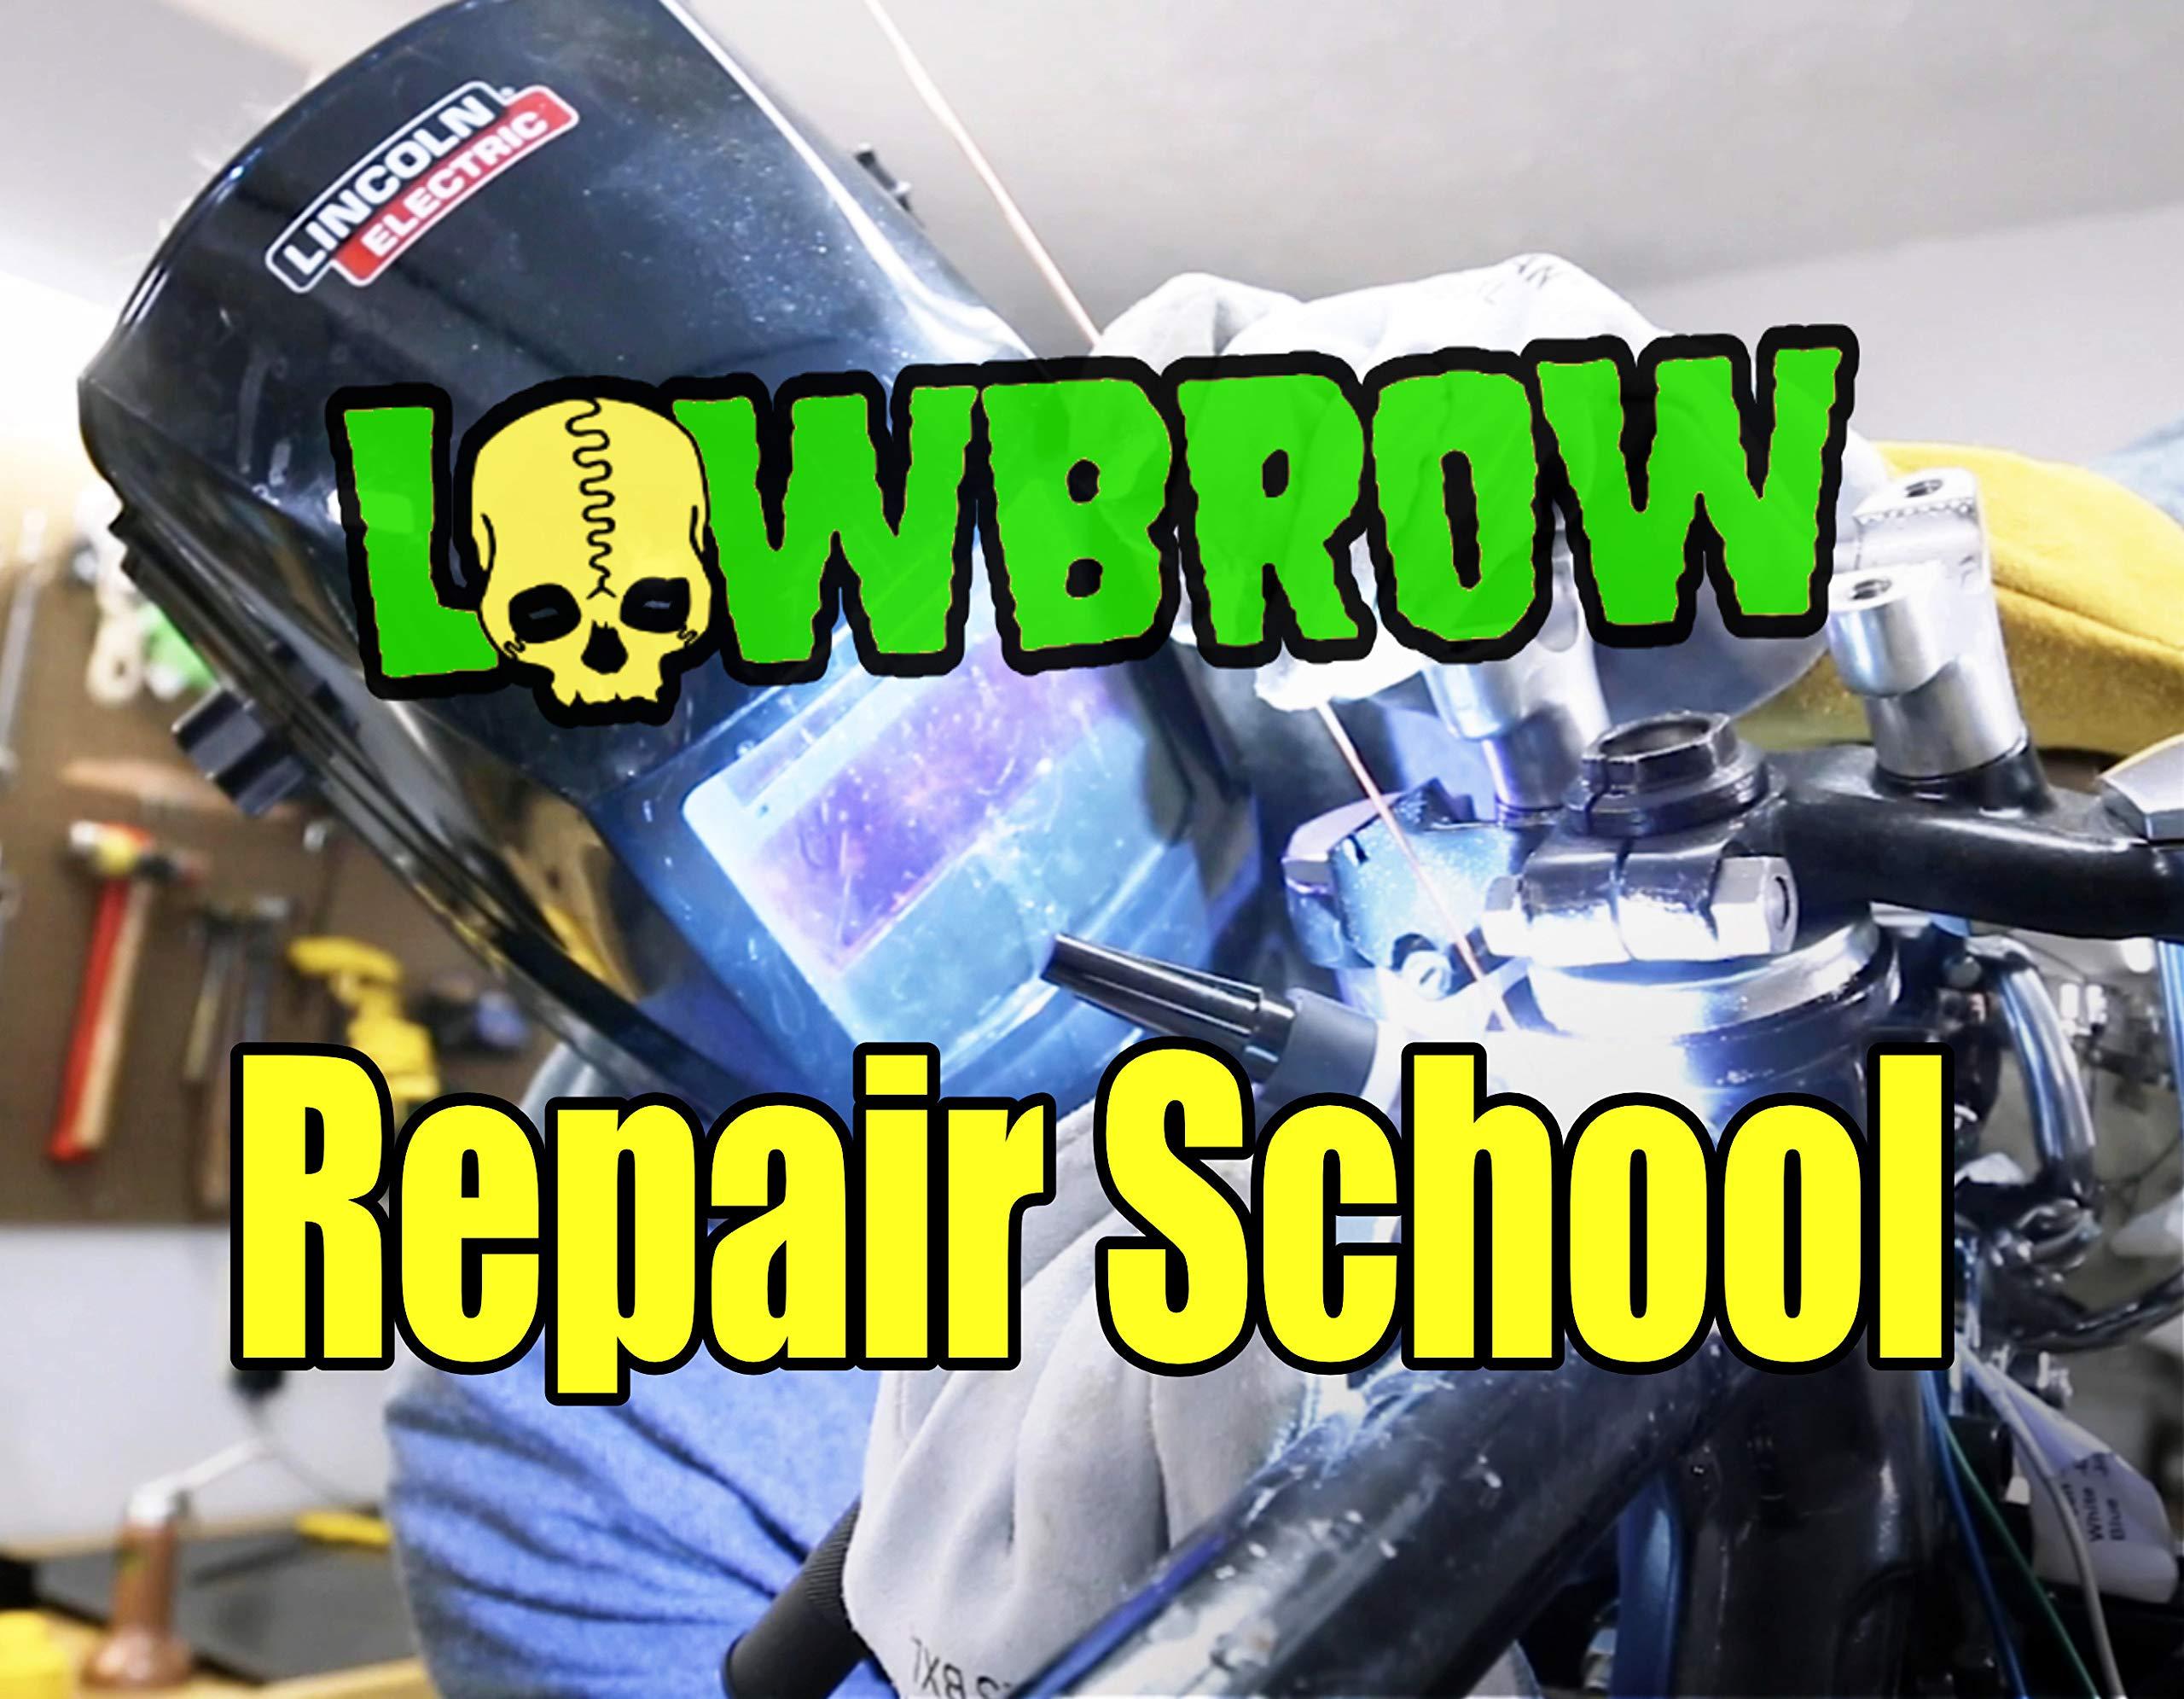 Lowbrow Repair School